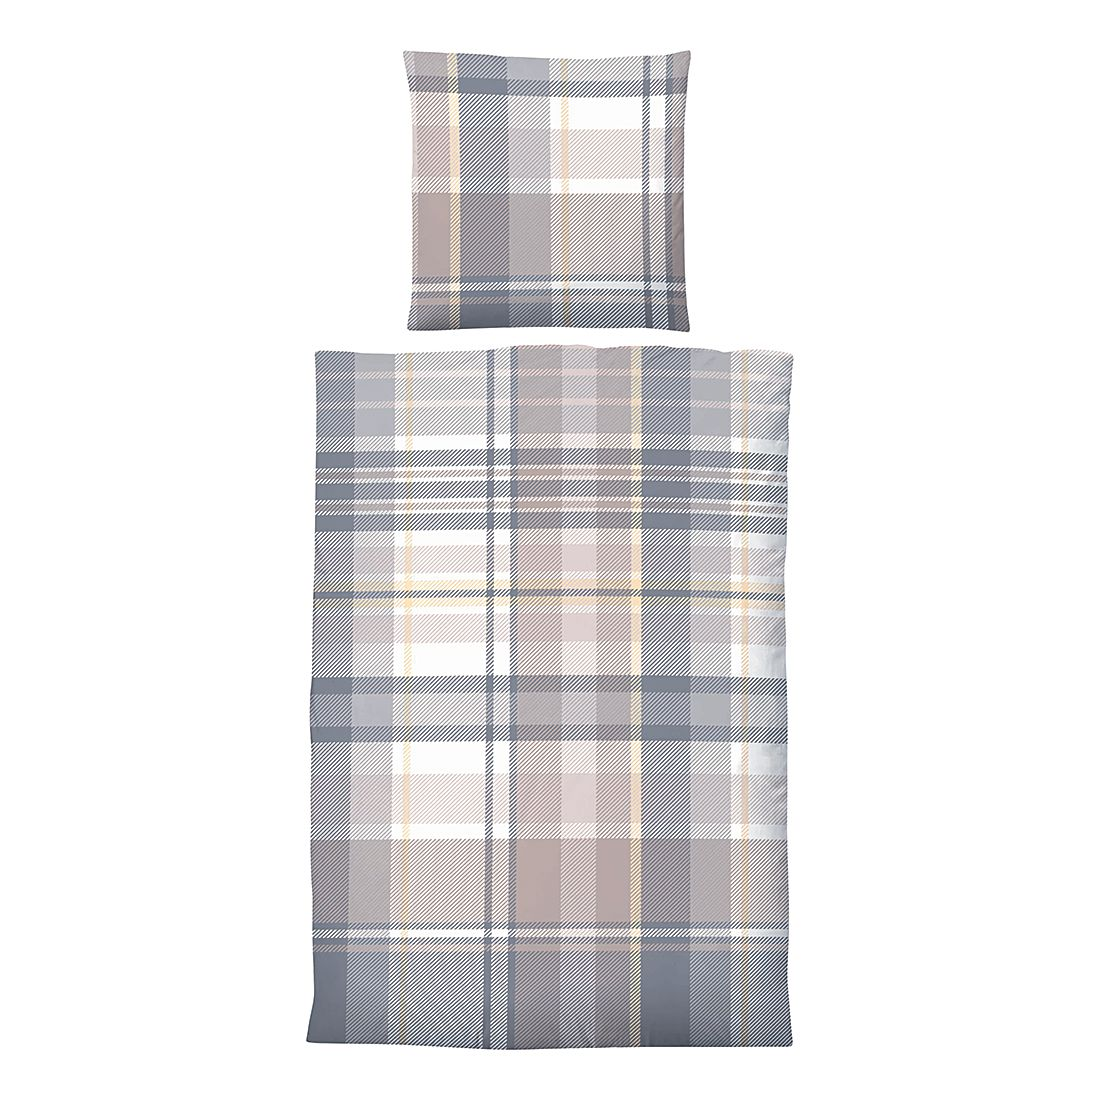 deluxe biber bettw sche christiane grau 155 x 220 cm kissen 80 x 80 cm biberna jetzt kaufen. Black Bedroom Furniture Sets. Home Design Ideas